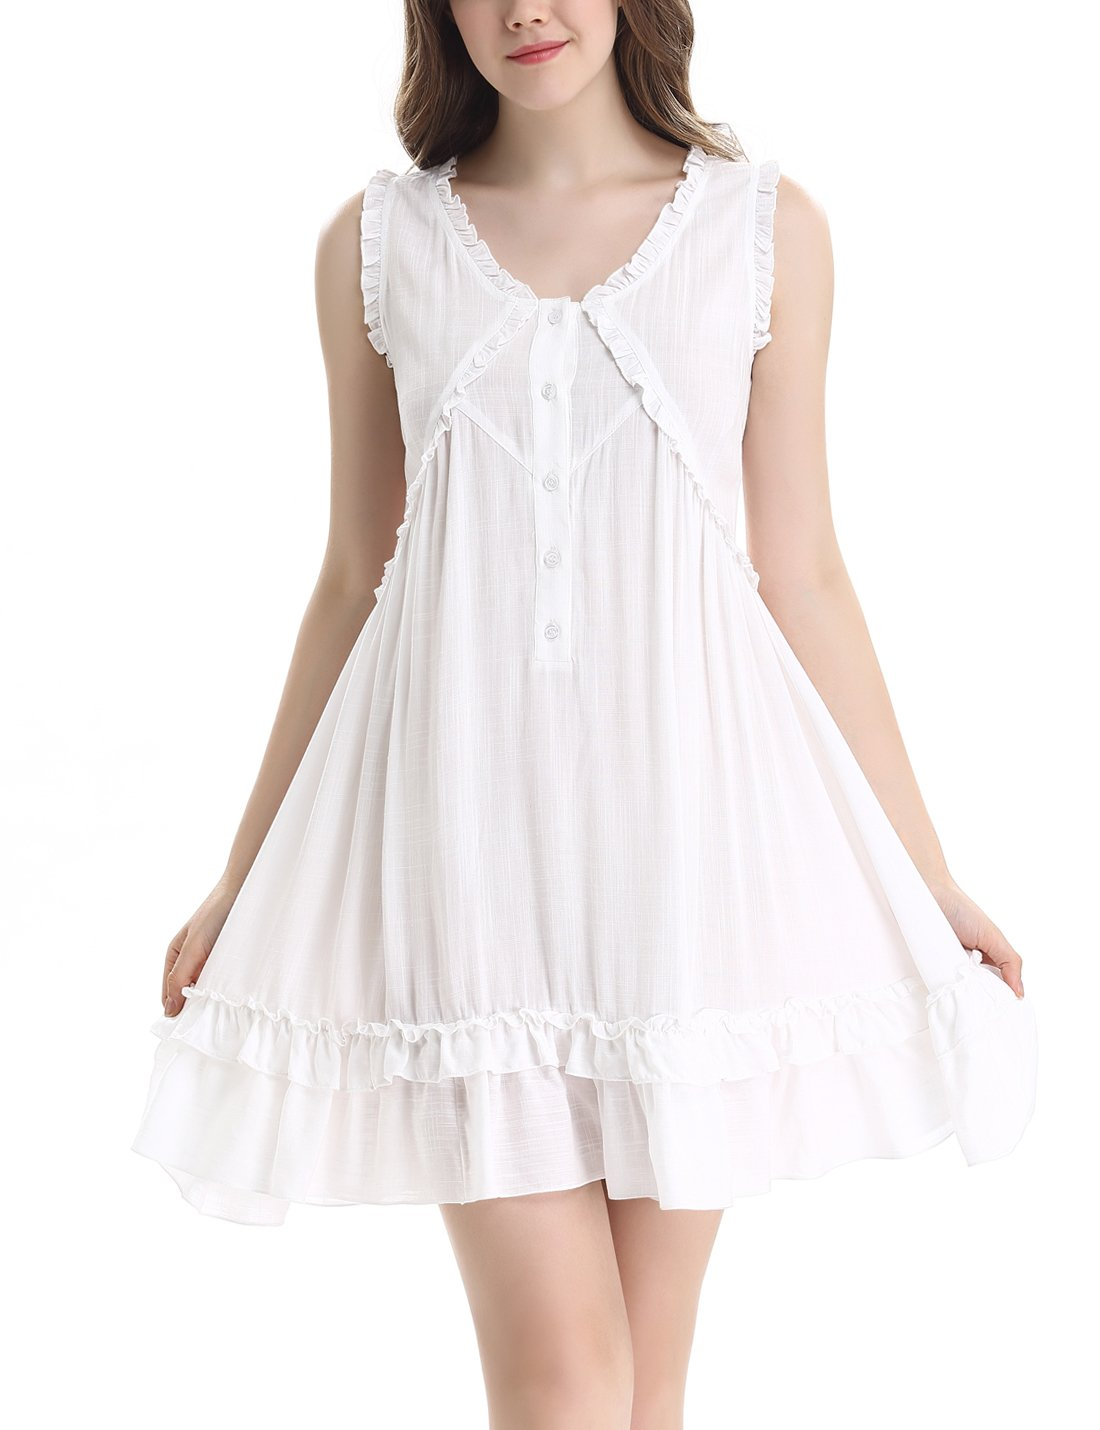 c3ac62a59dce NORA TWIPS Ladies Summer Nightwear, Nighties, Sleeveless Nightgown Women,  Victorian Vintage Nightshirt Sleepwear, Button Front Nightdress OY031